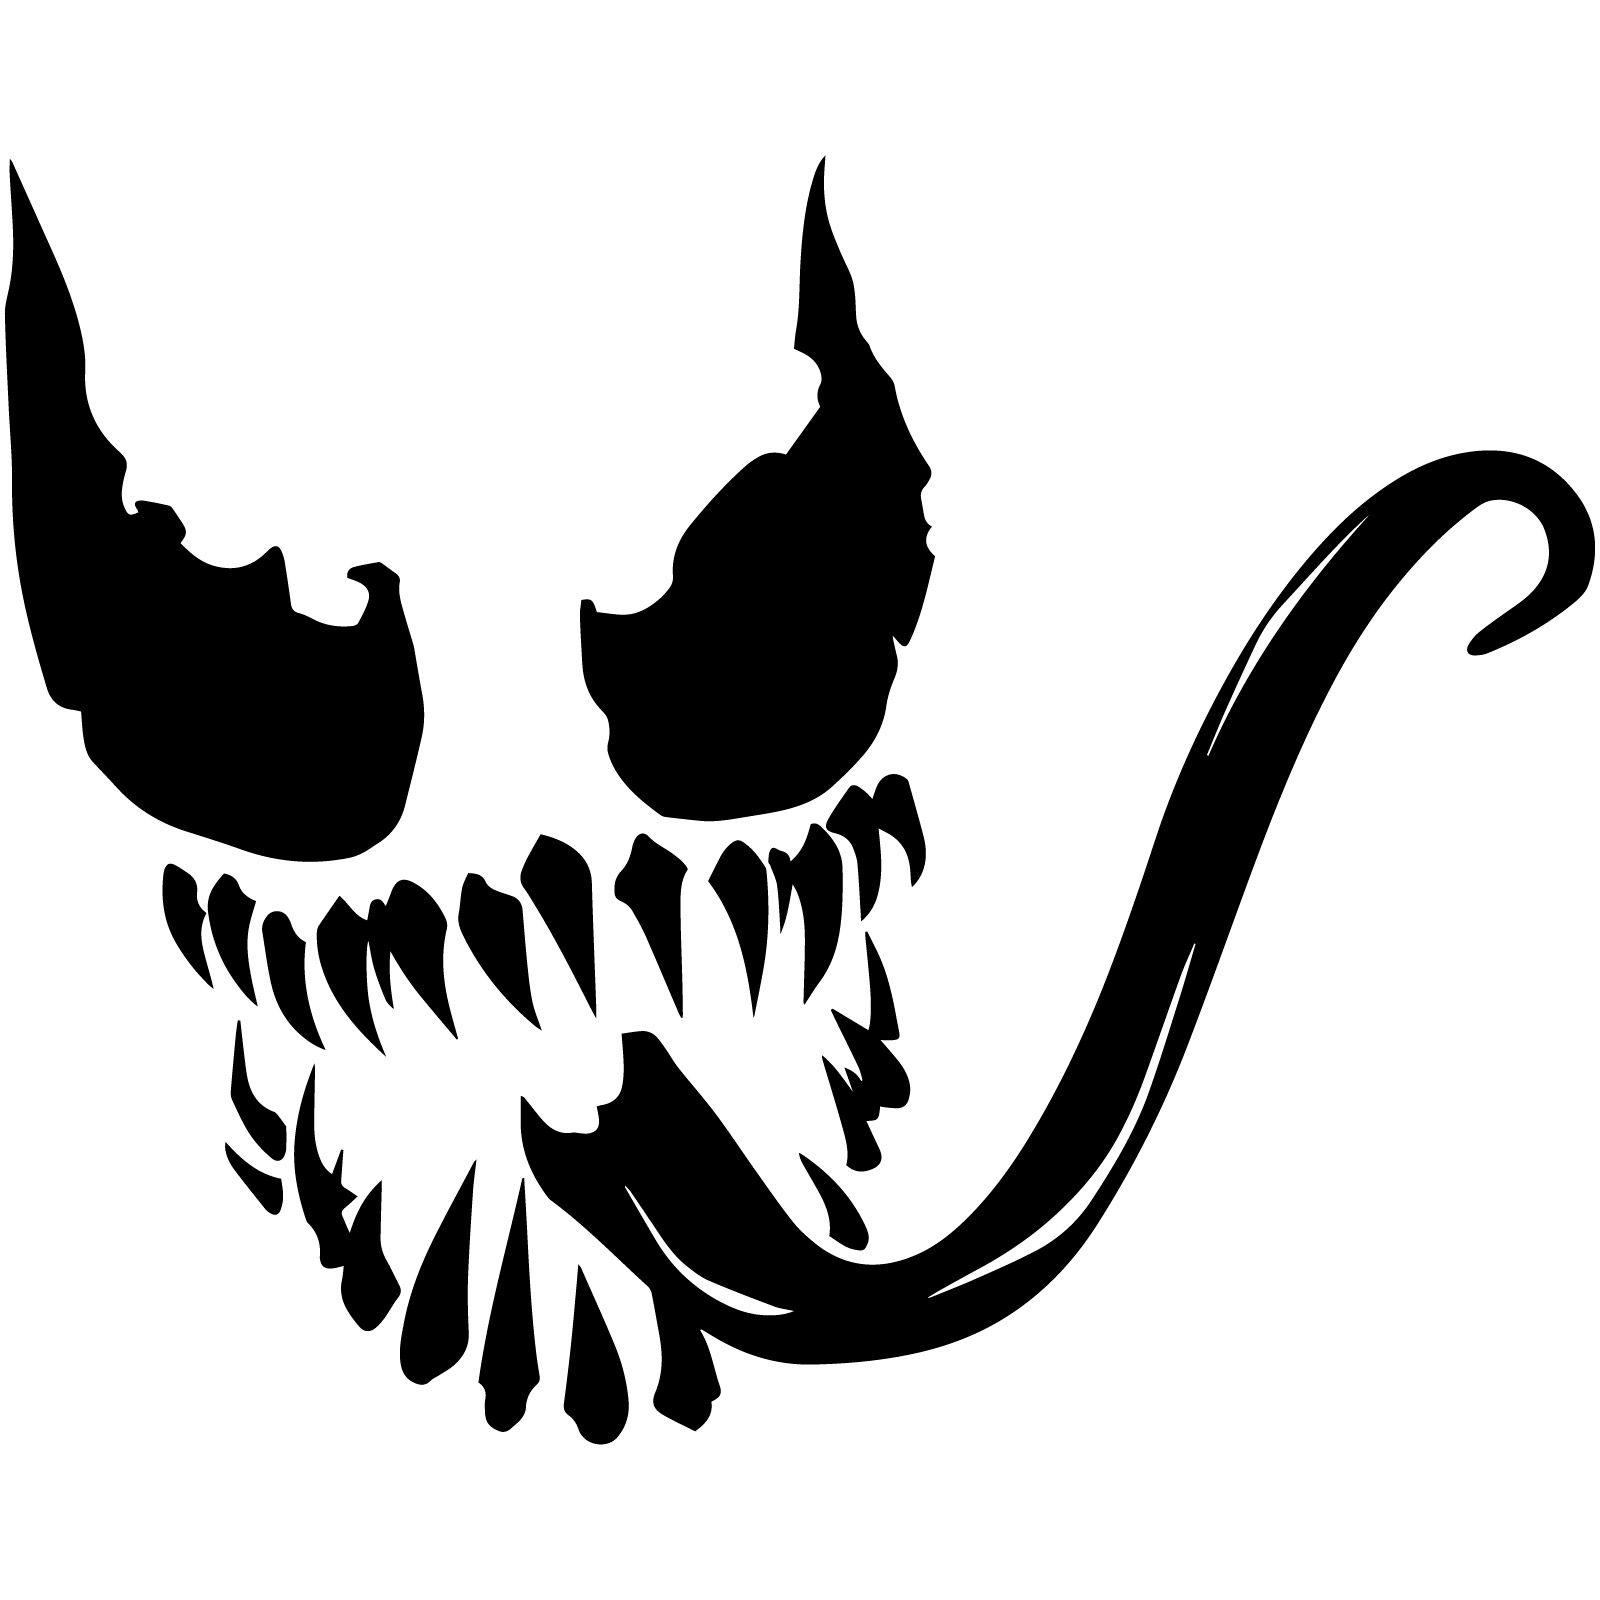 Venom Decal Superhero Decal Vinyl Sticker Comic Book Decal Car Truck Laptop Yeti Tumbler Wall Window Decor Nature Decal Vinyl Decal Stickers Butterfly Decal [ 1393 x 1699 Pixel ]